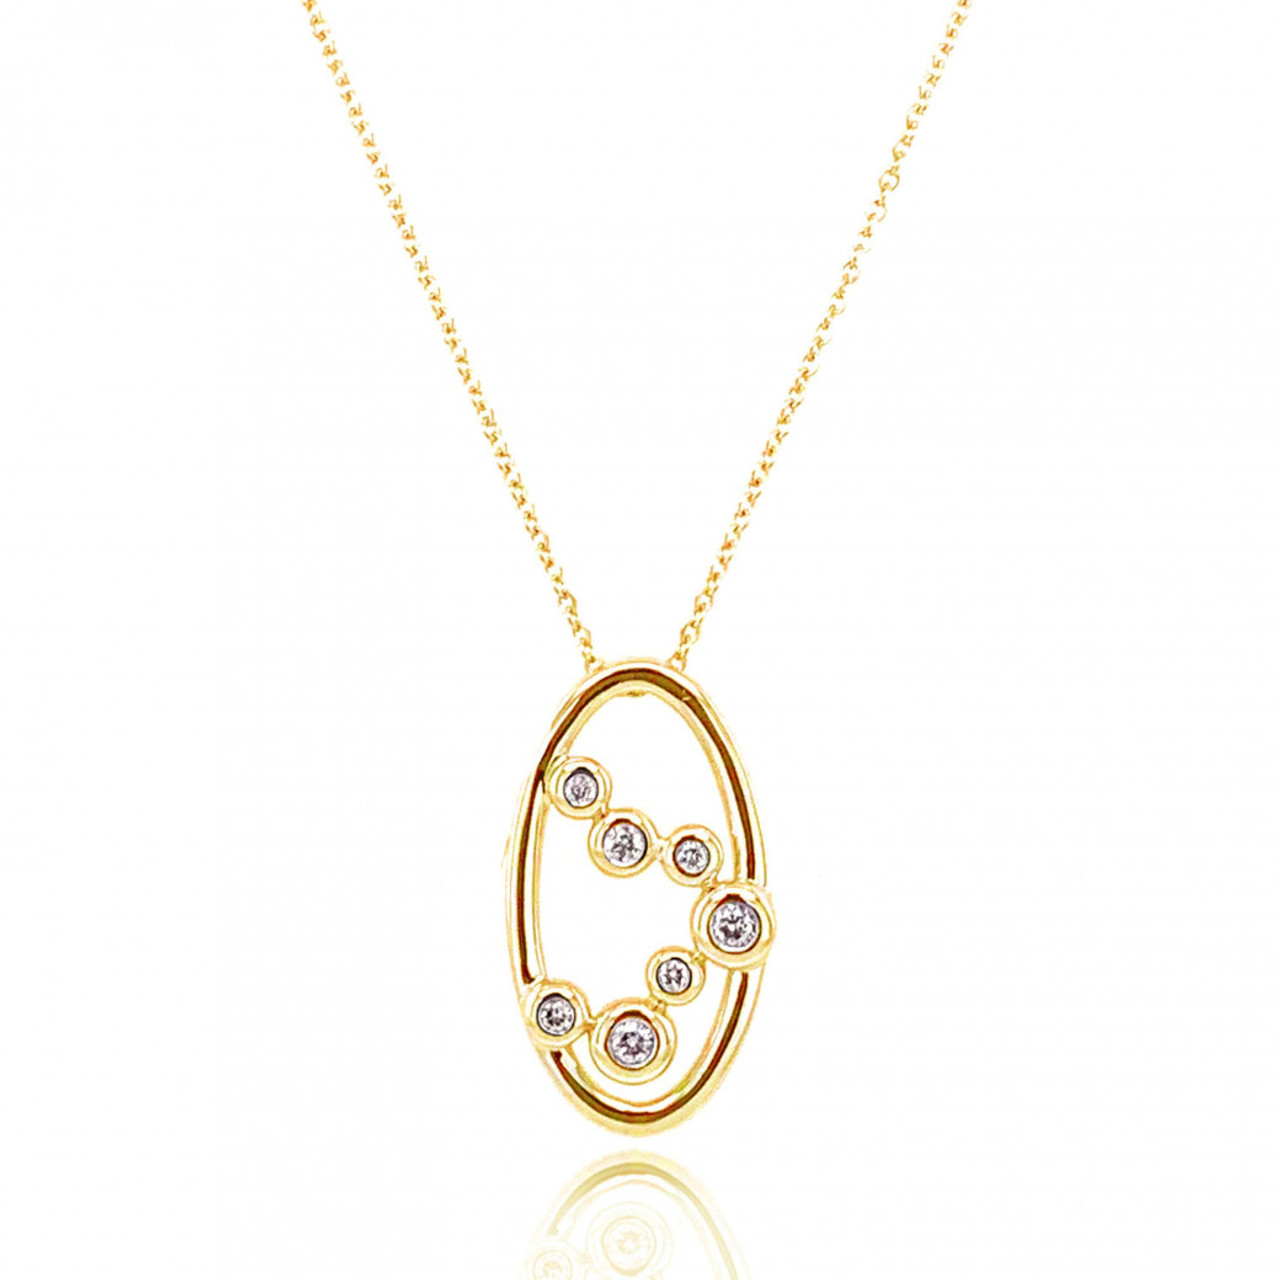 9ct Yellow Gold Diamond Bubble Pendant Necklace